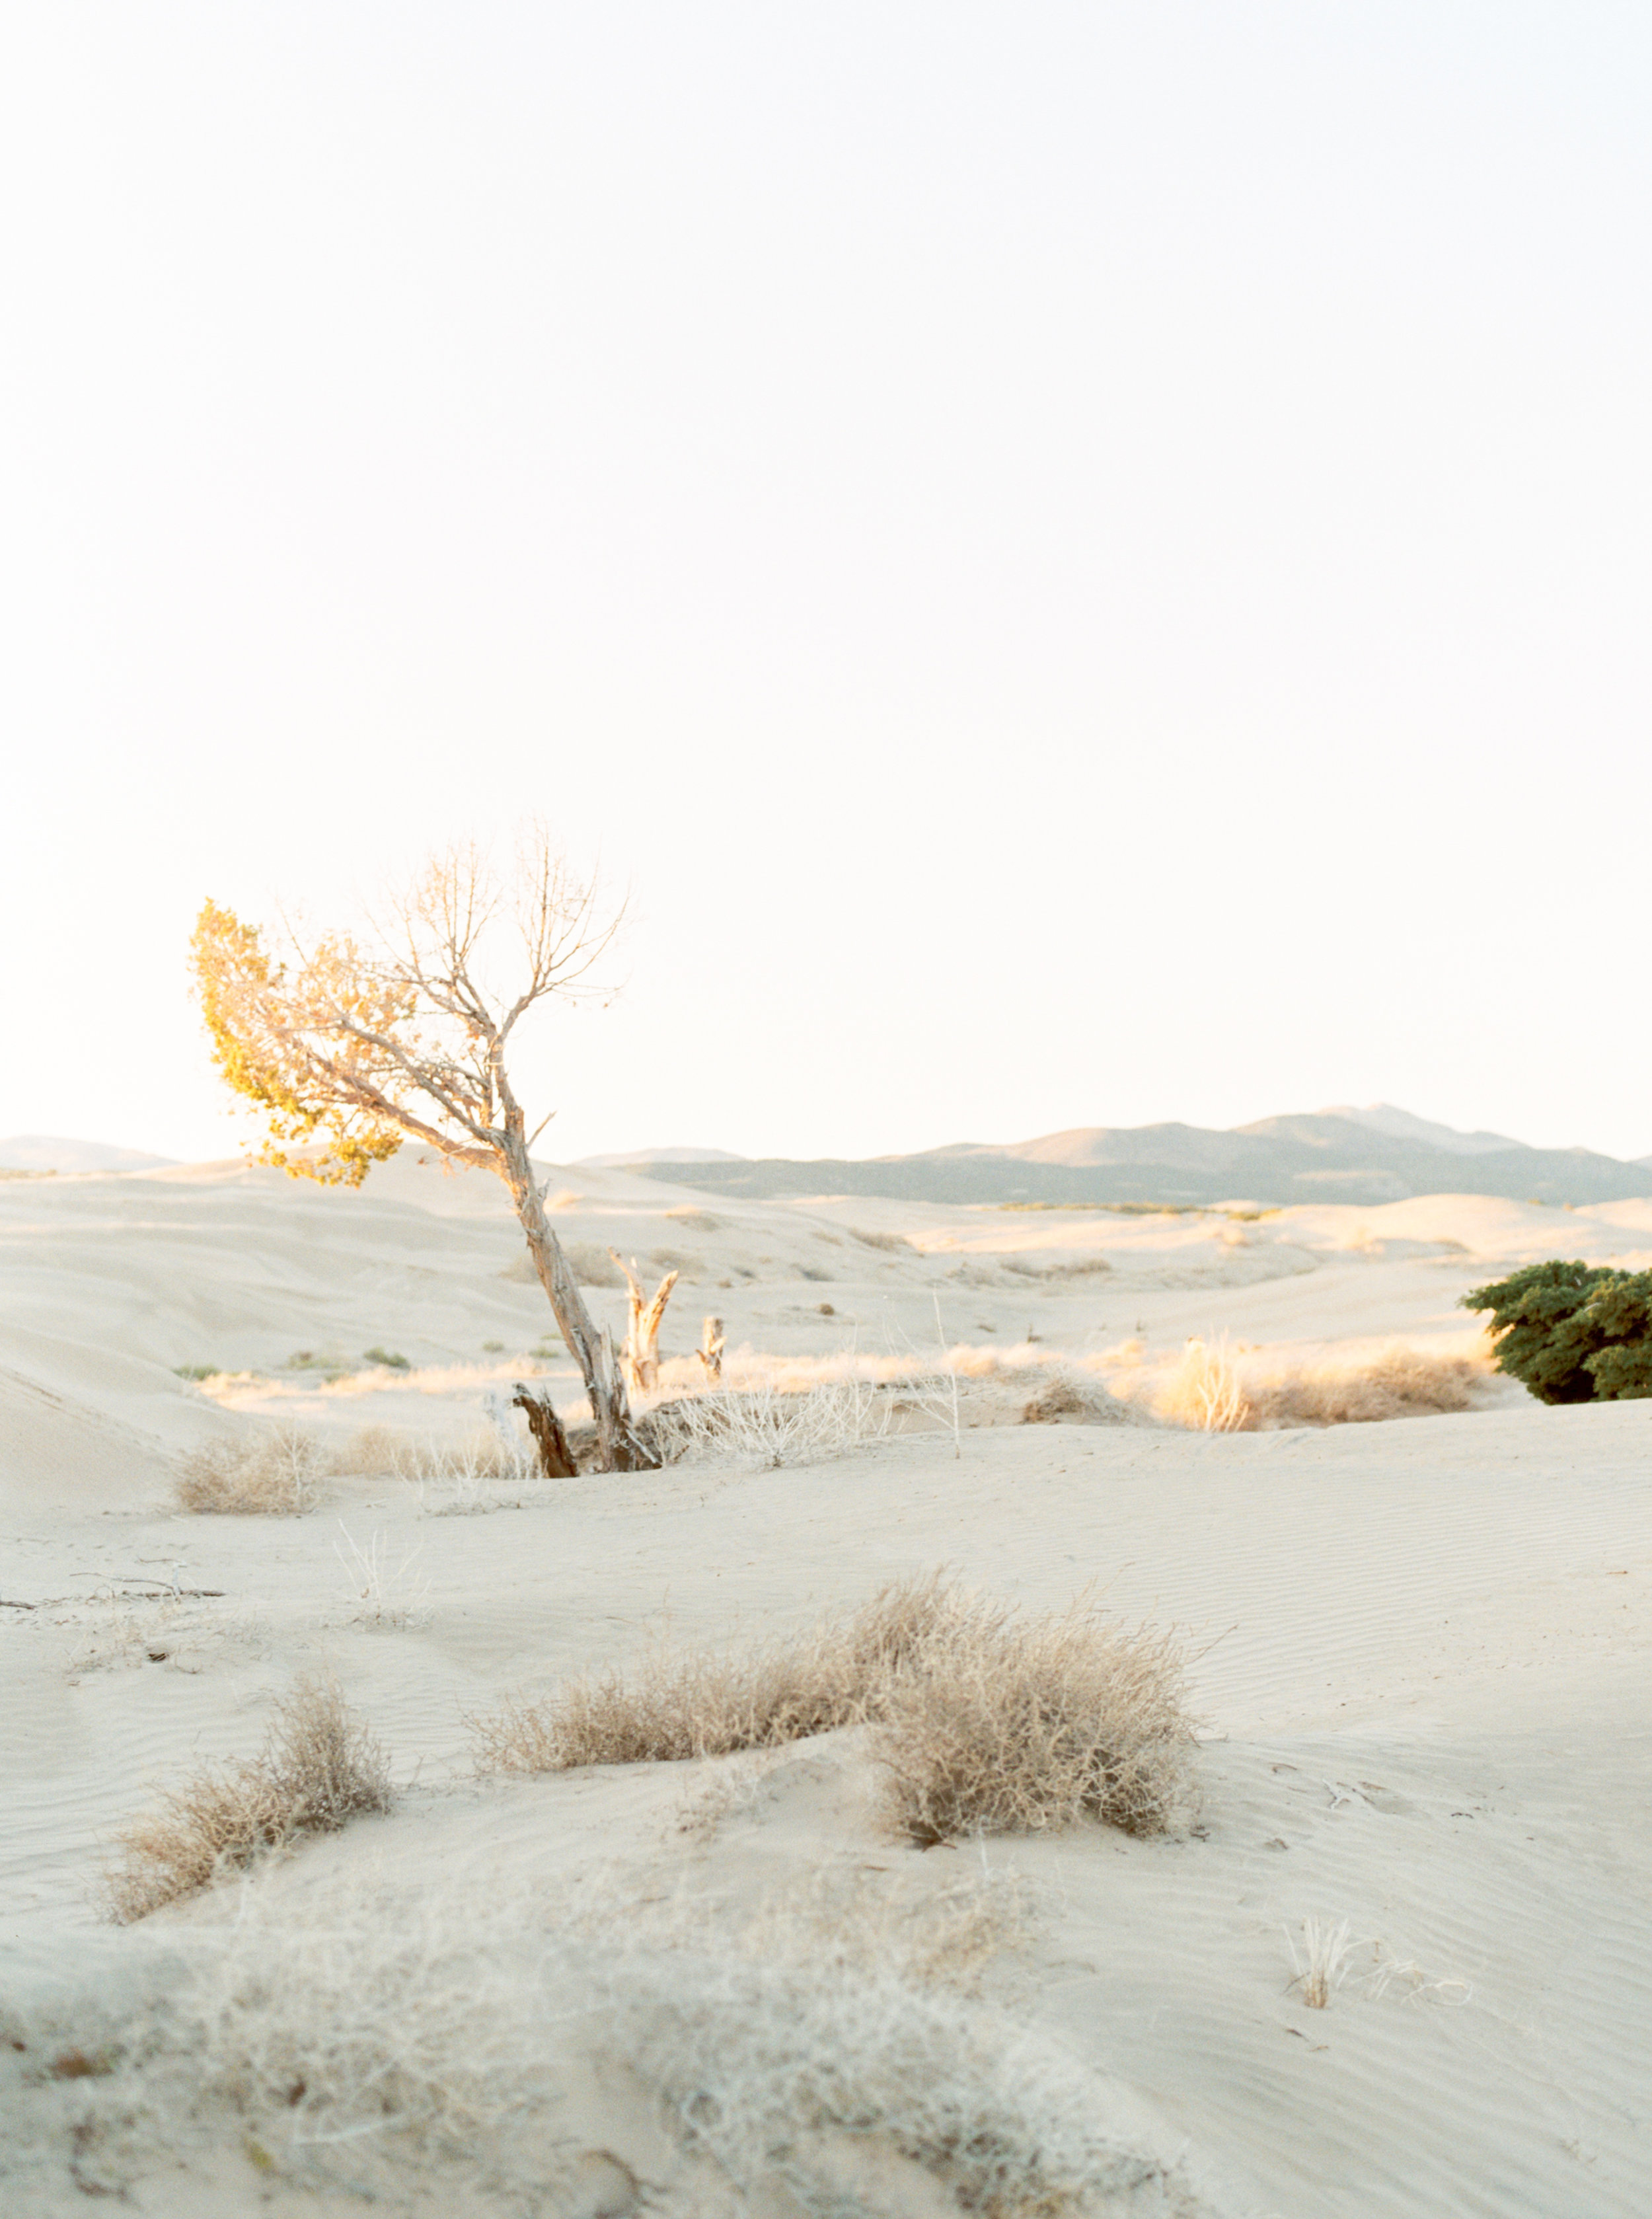 Callie Manion Photography_Desert Sand Dunes Editorial_119.jpg